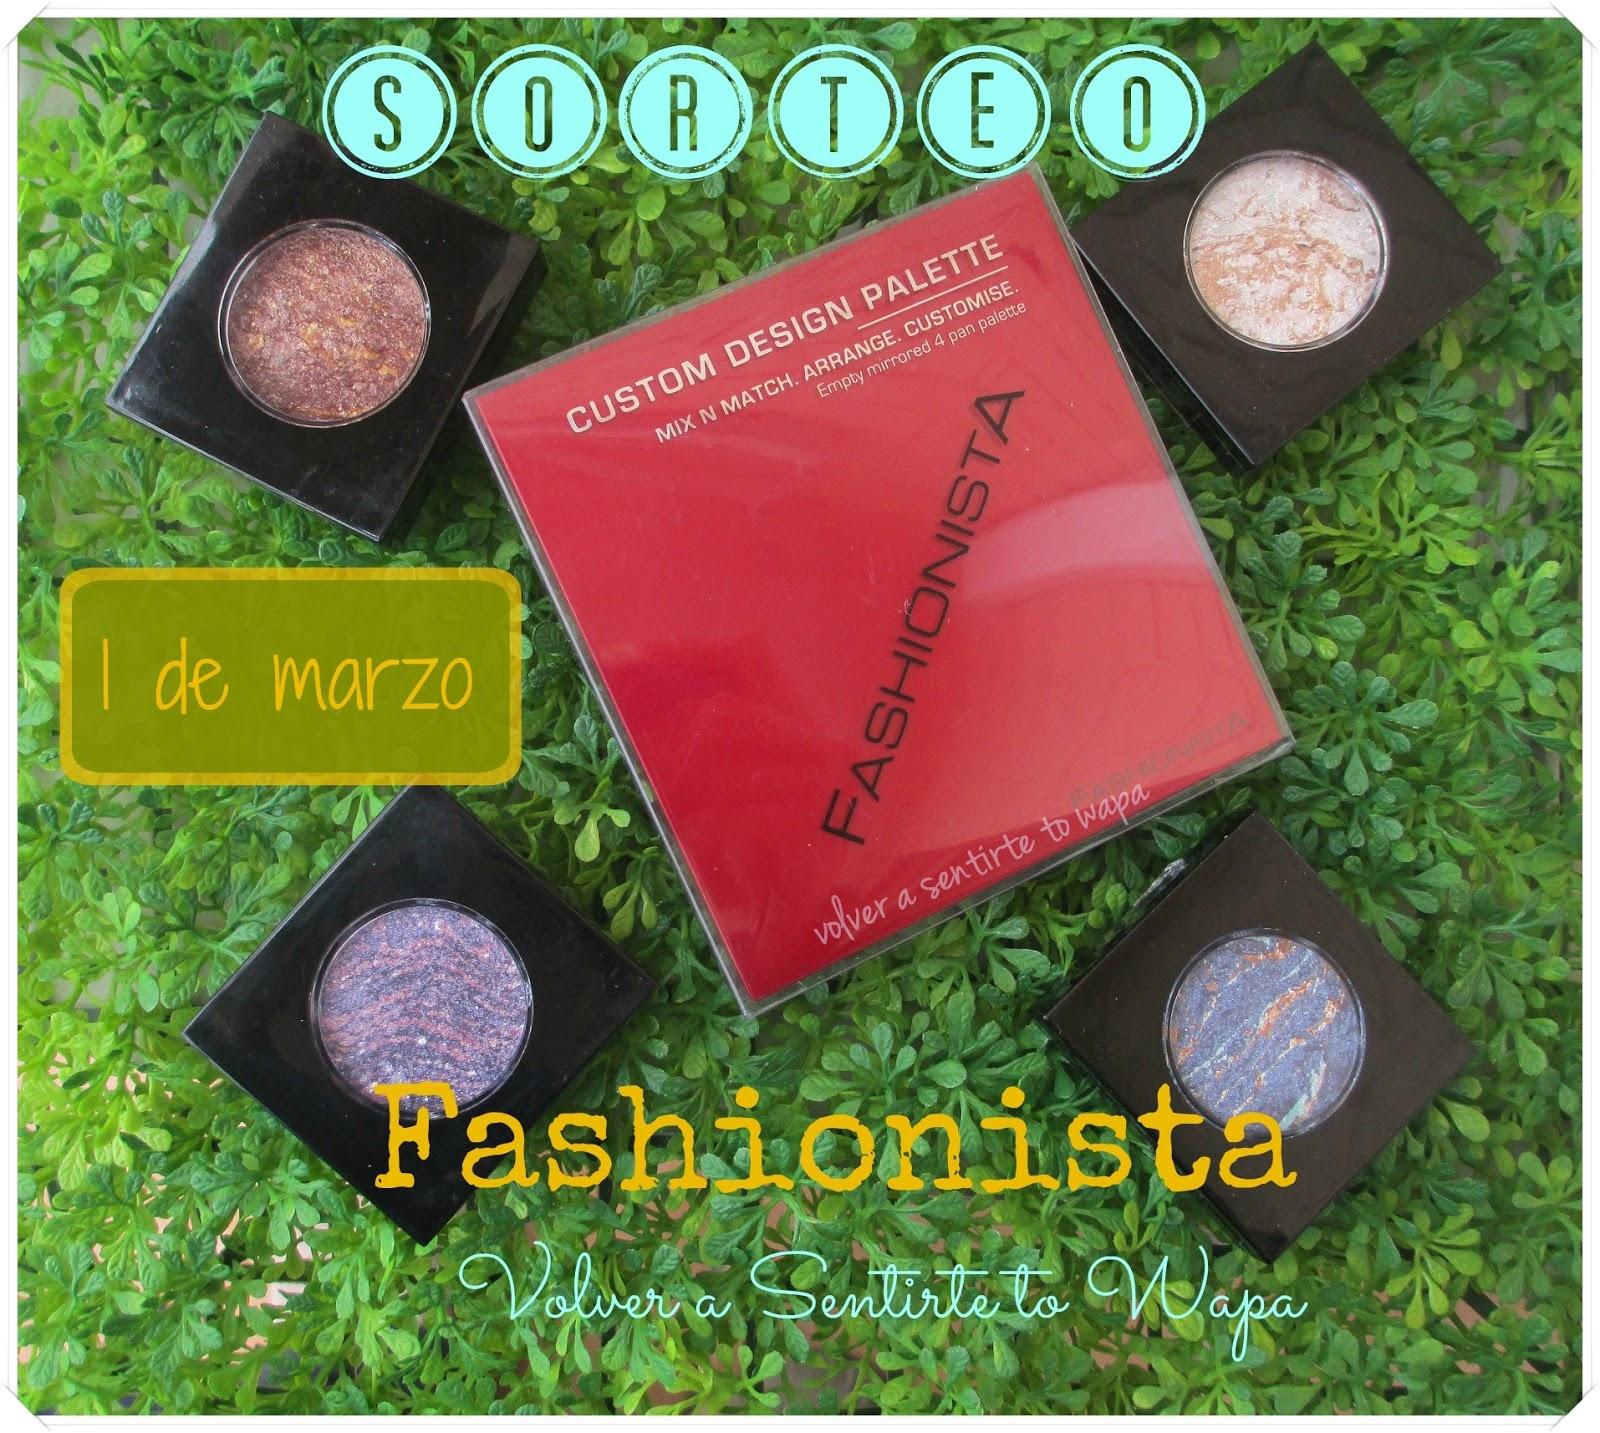 Sorteo Fashionista Volver a Sentirte to Wapa